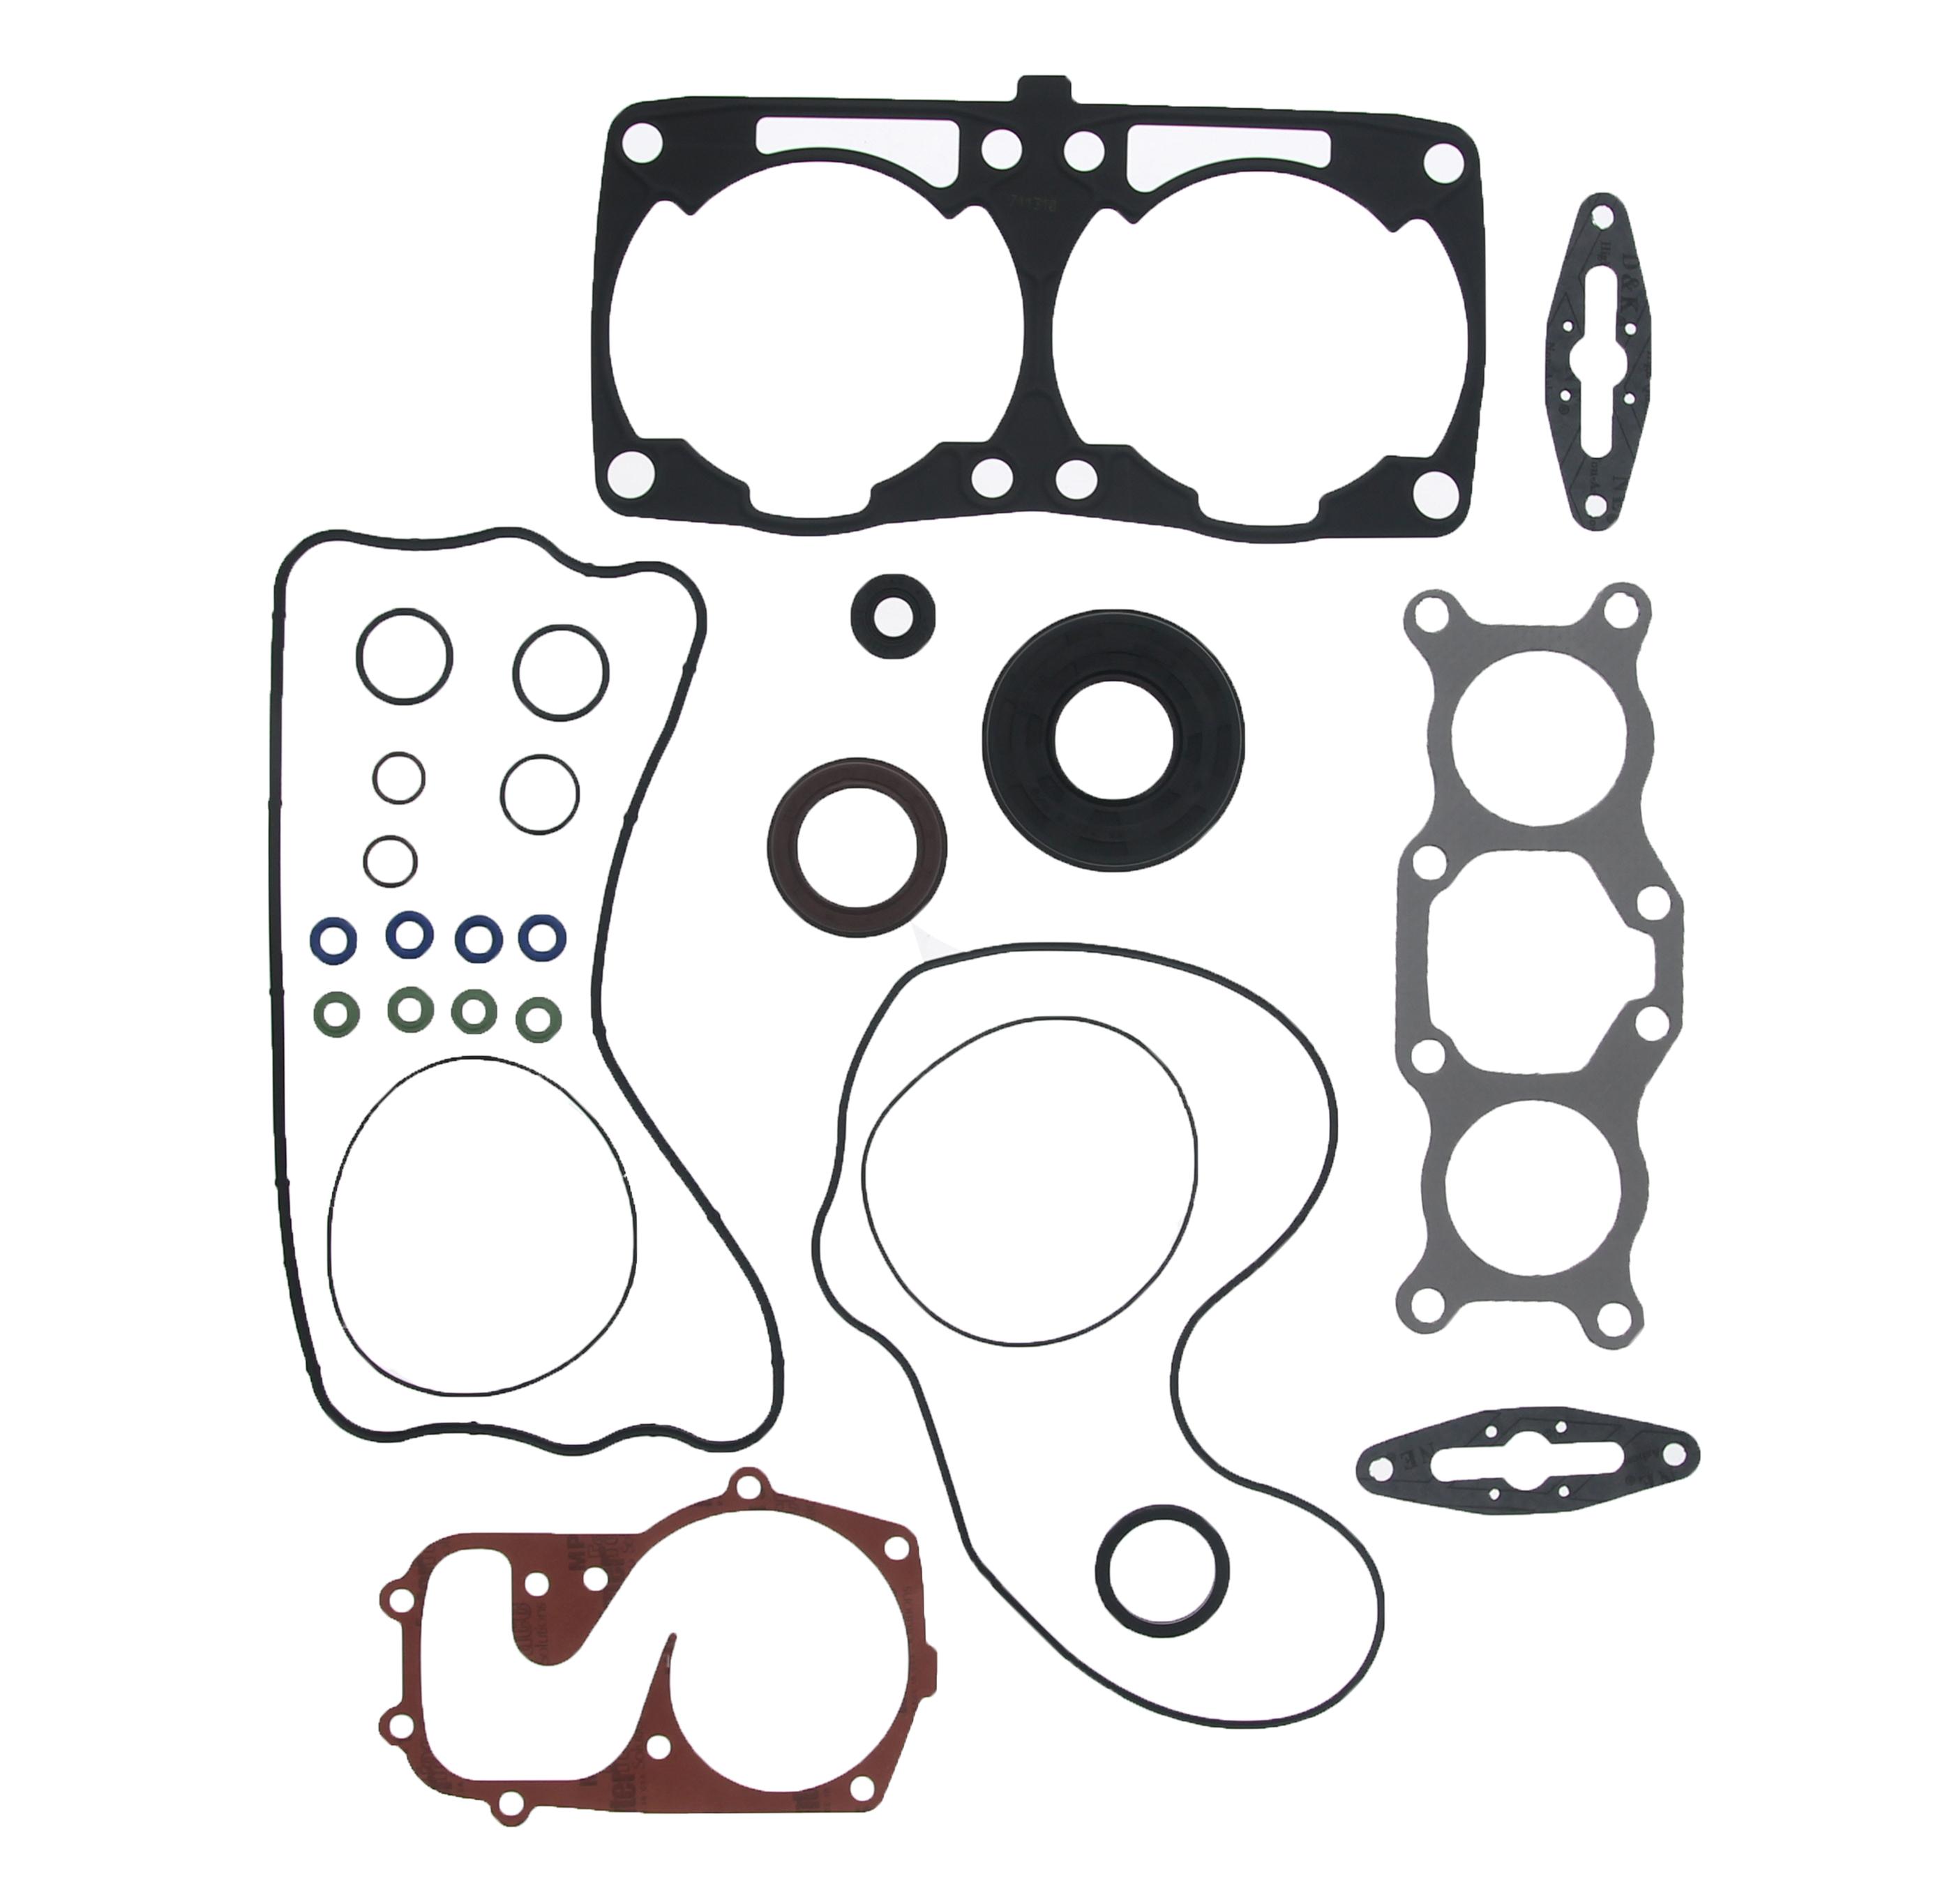 Complete Gasket Kit Fits Polaris Switchback 800